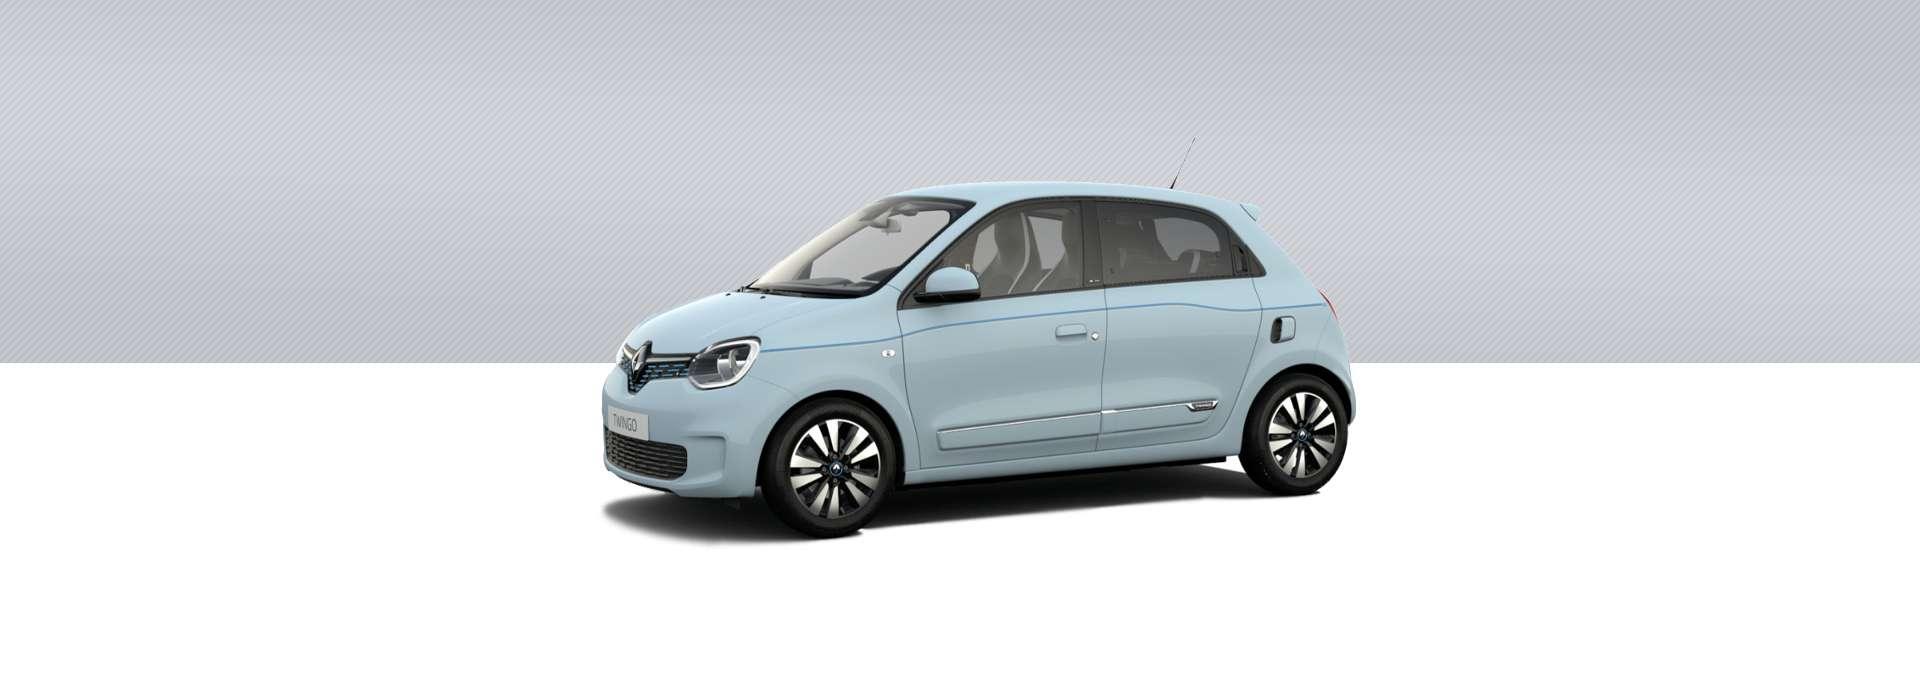 Renault NUEVO TWINGO ELECTRIC